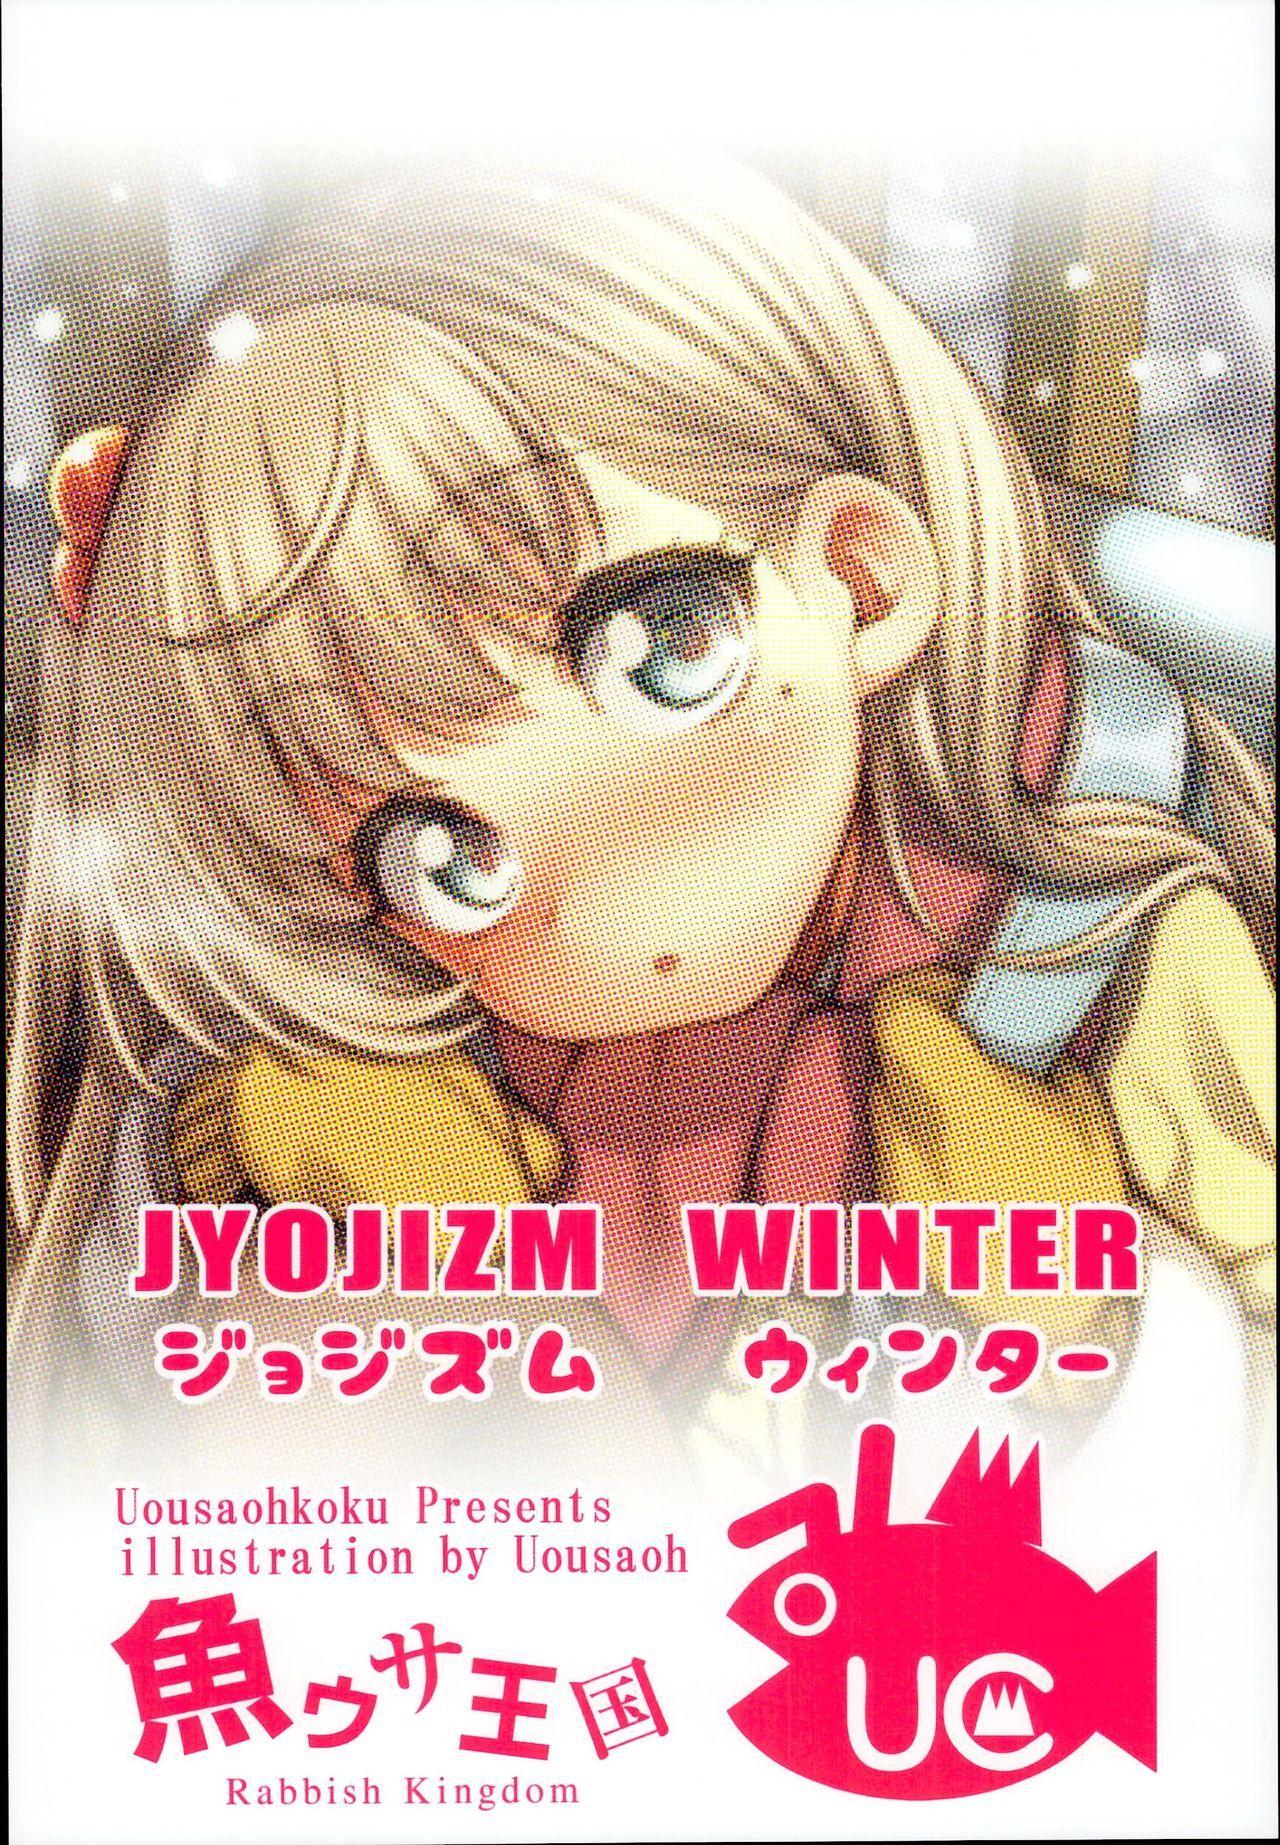 JYOJIZM WINTER 29